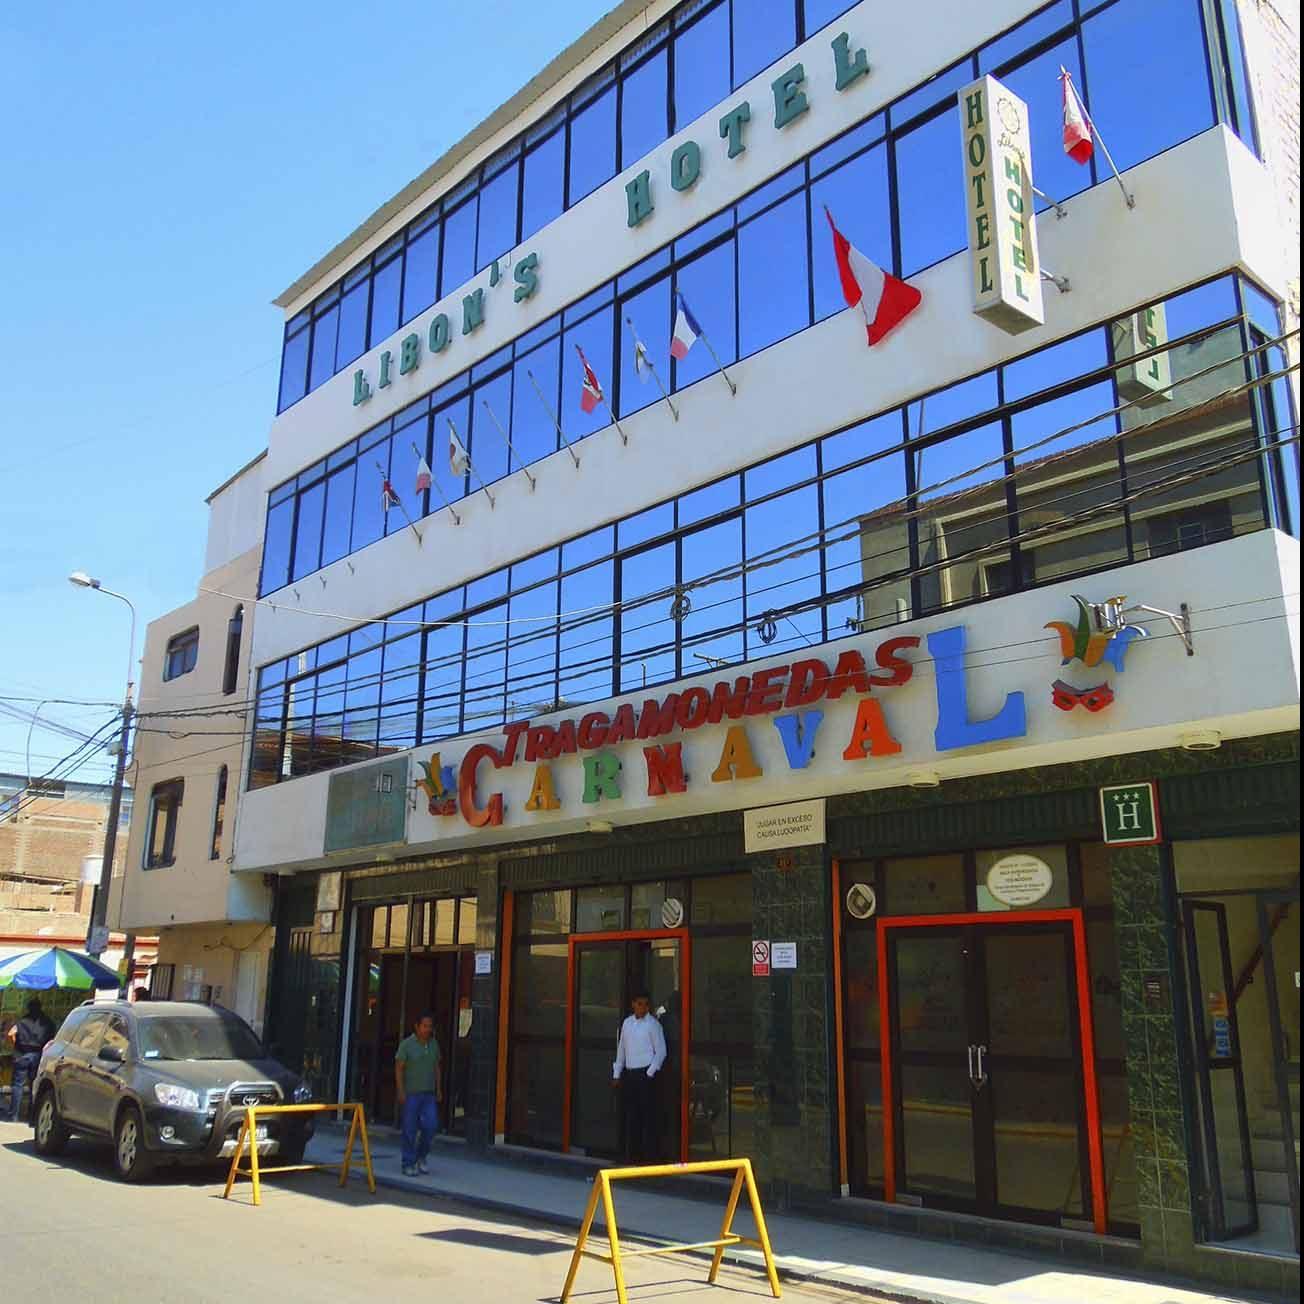 Libon's Hotel